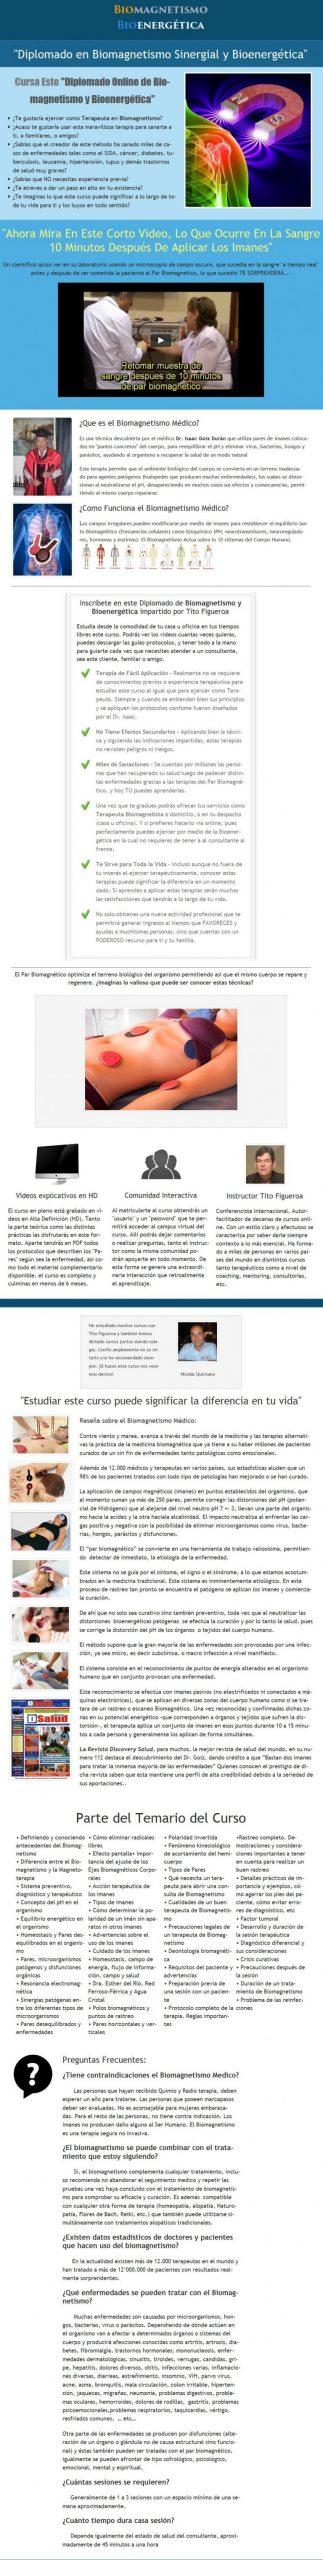 Biomagnetismo Sinergial y Bioenergética – Tito Figueroa